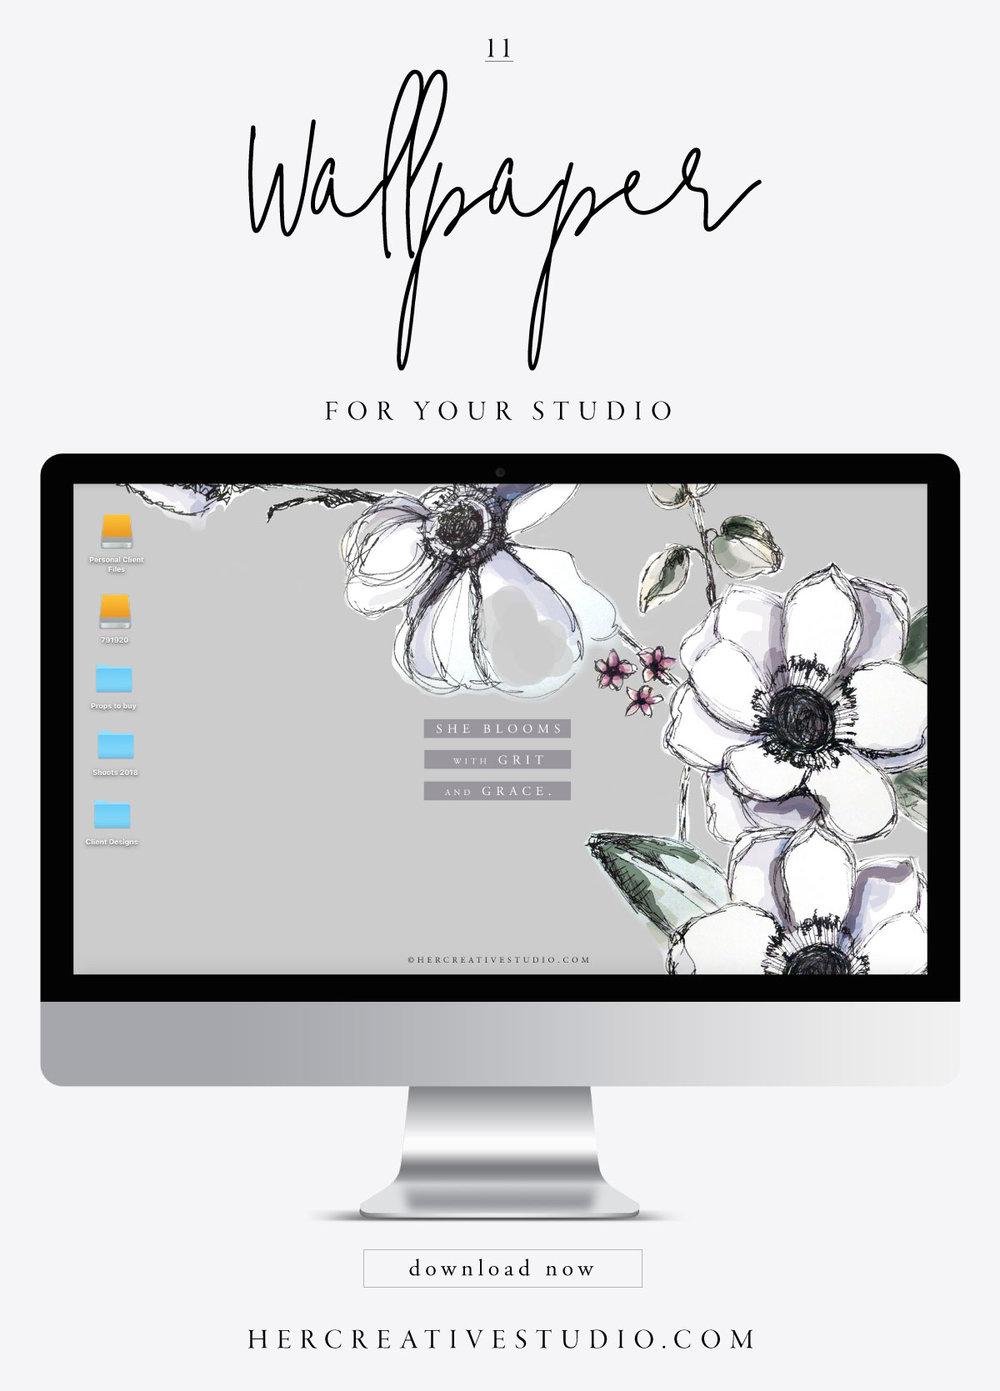 Freebie-November-WALLPAPER.jpg